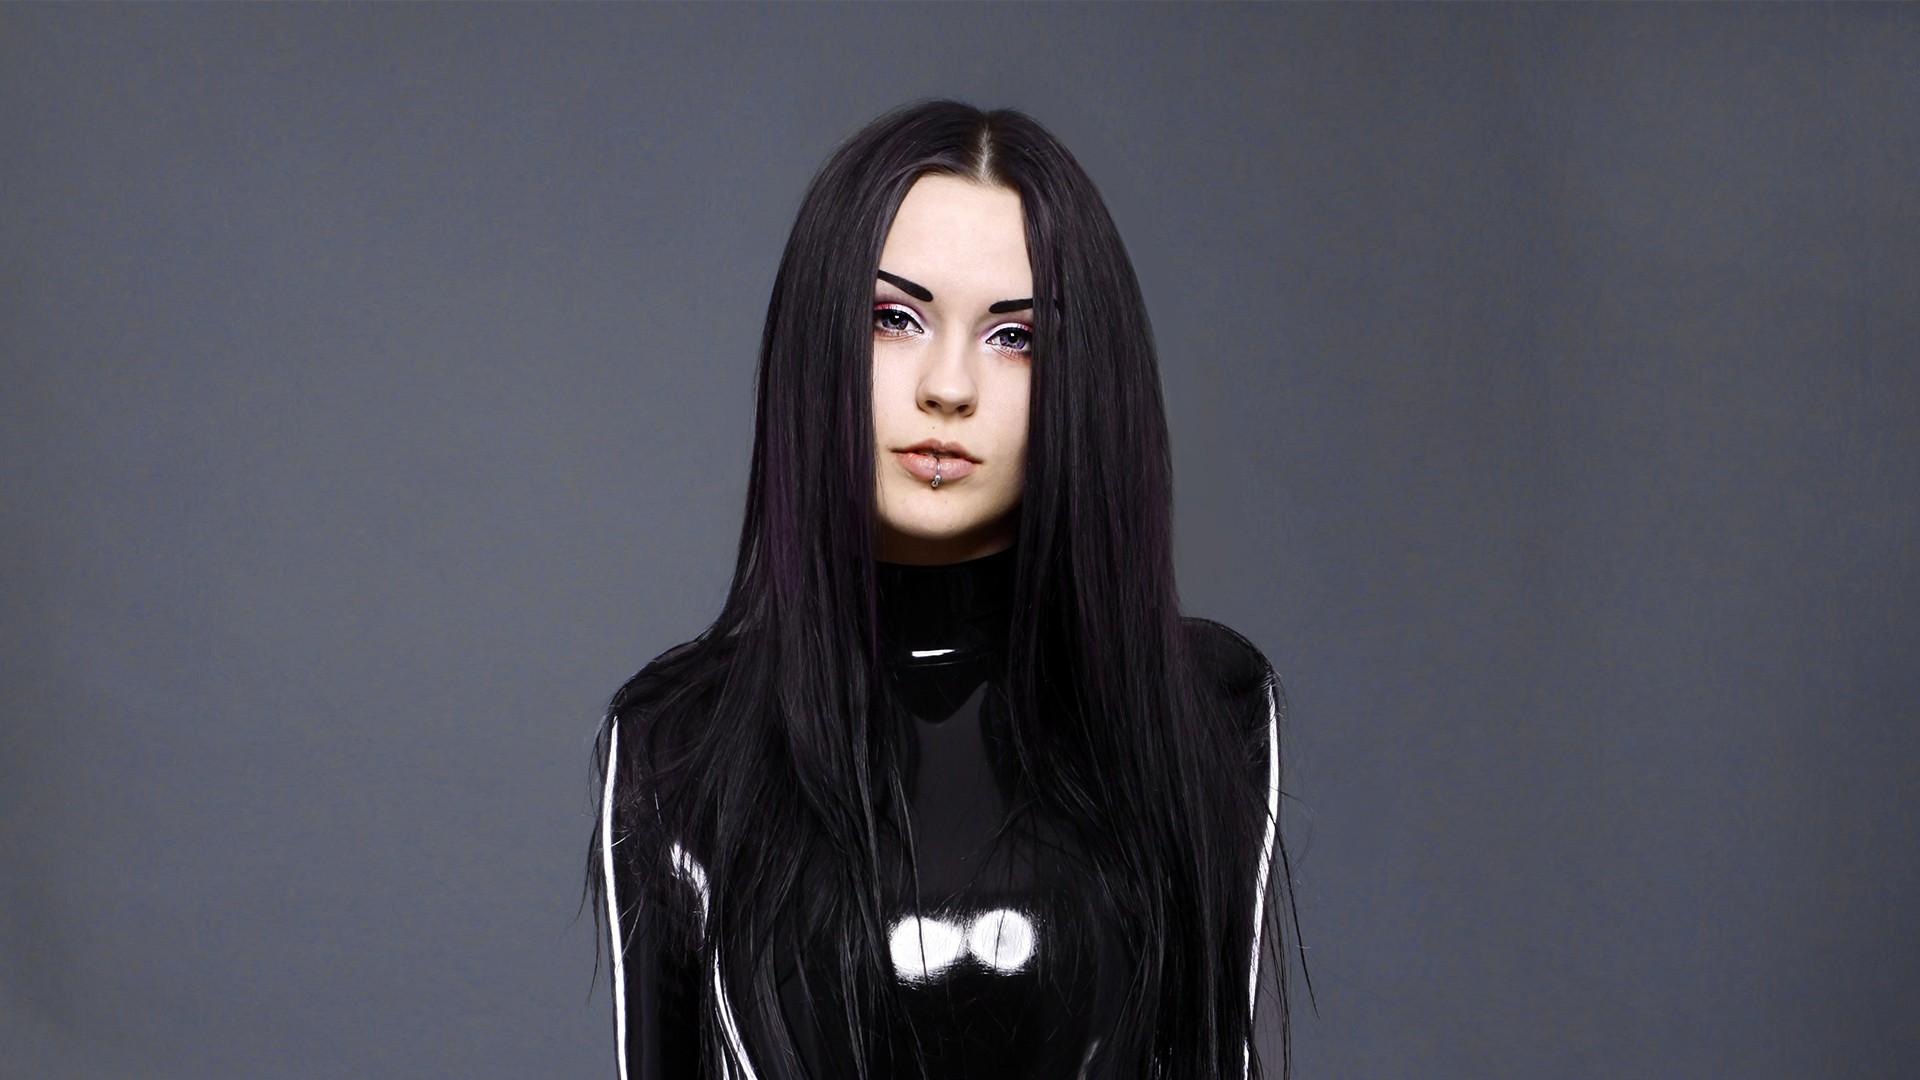 Wallpaper Women Model Dark Hair Fashion Pierced Lips Violet